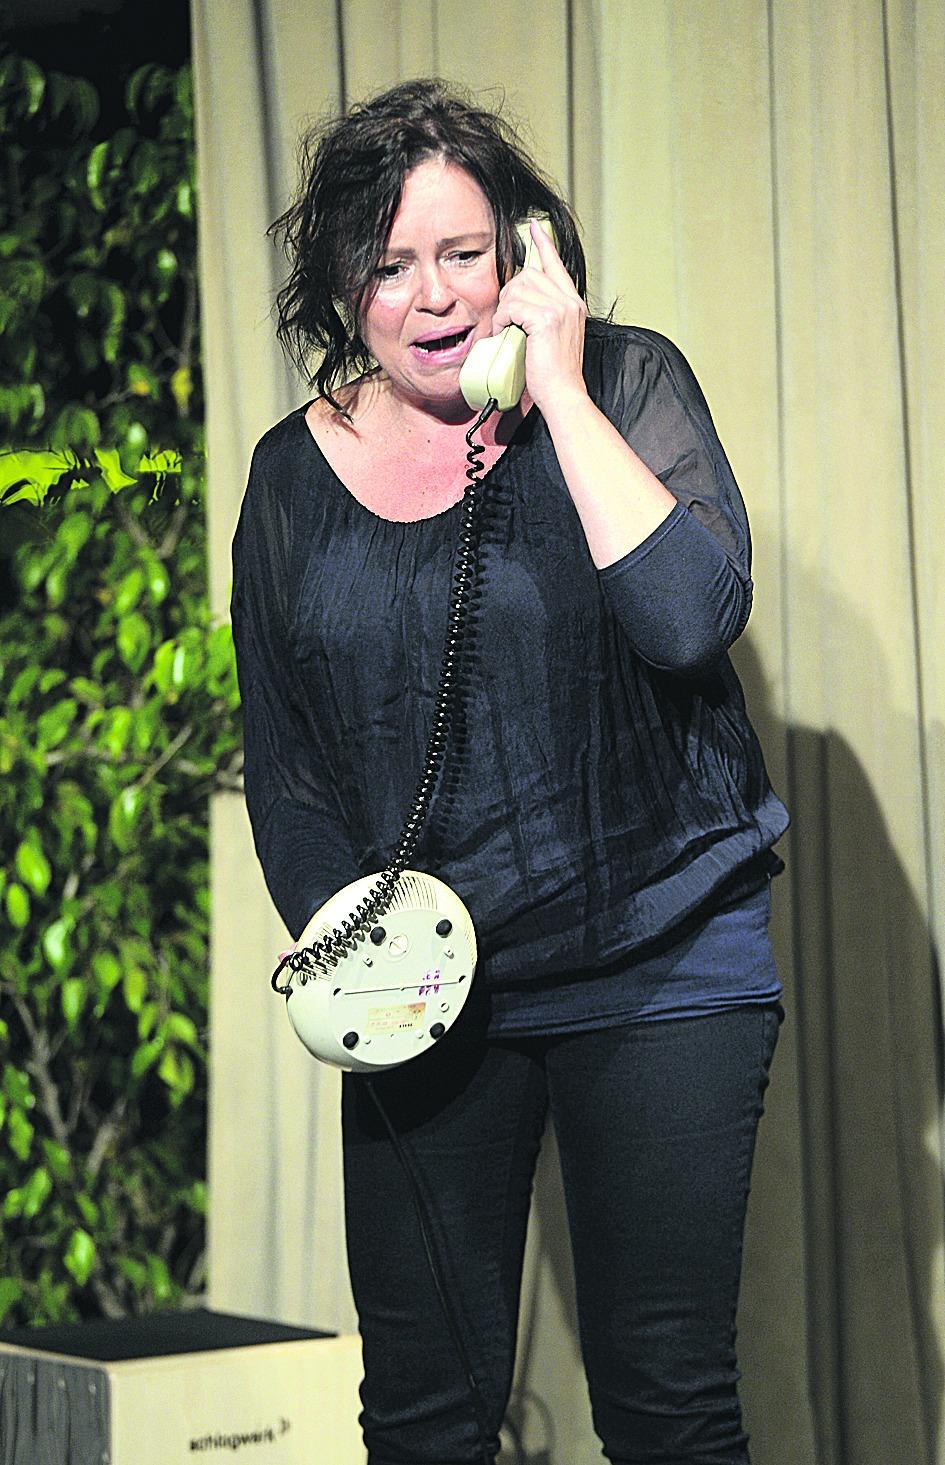 Jitka Sedláčková má jedinou rekvizitu – telefon.